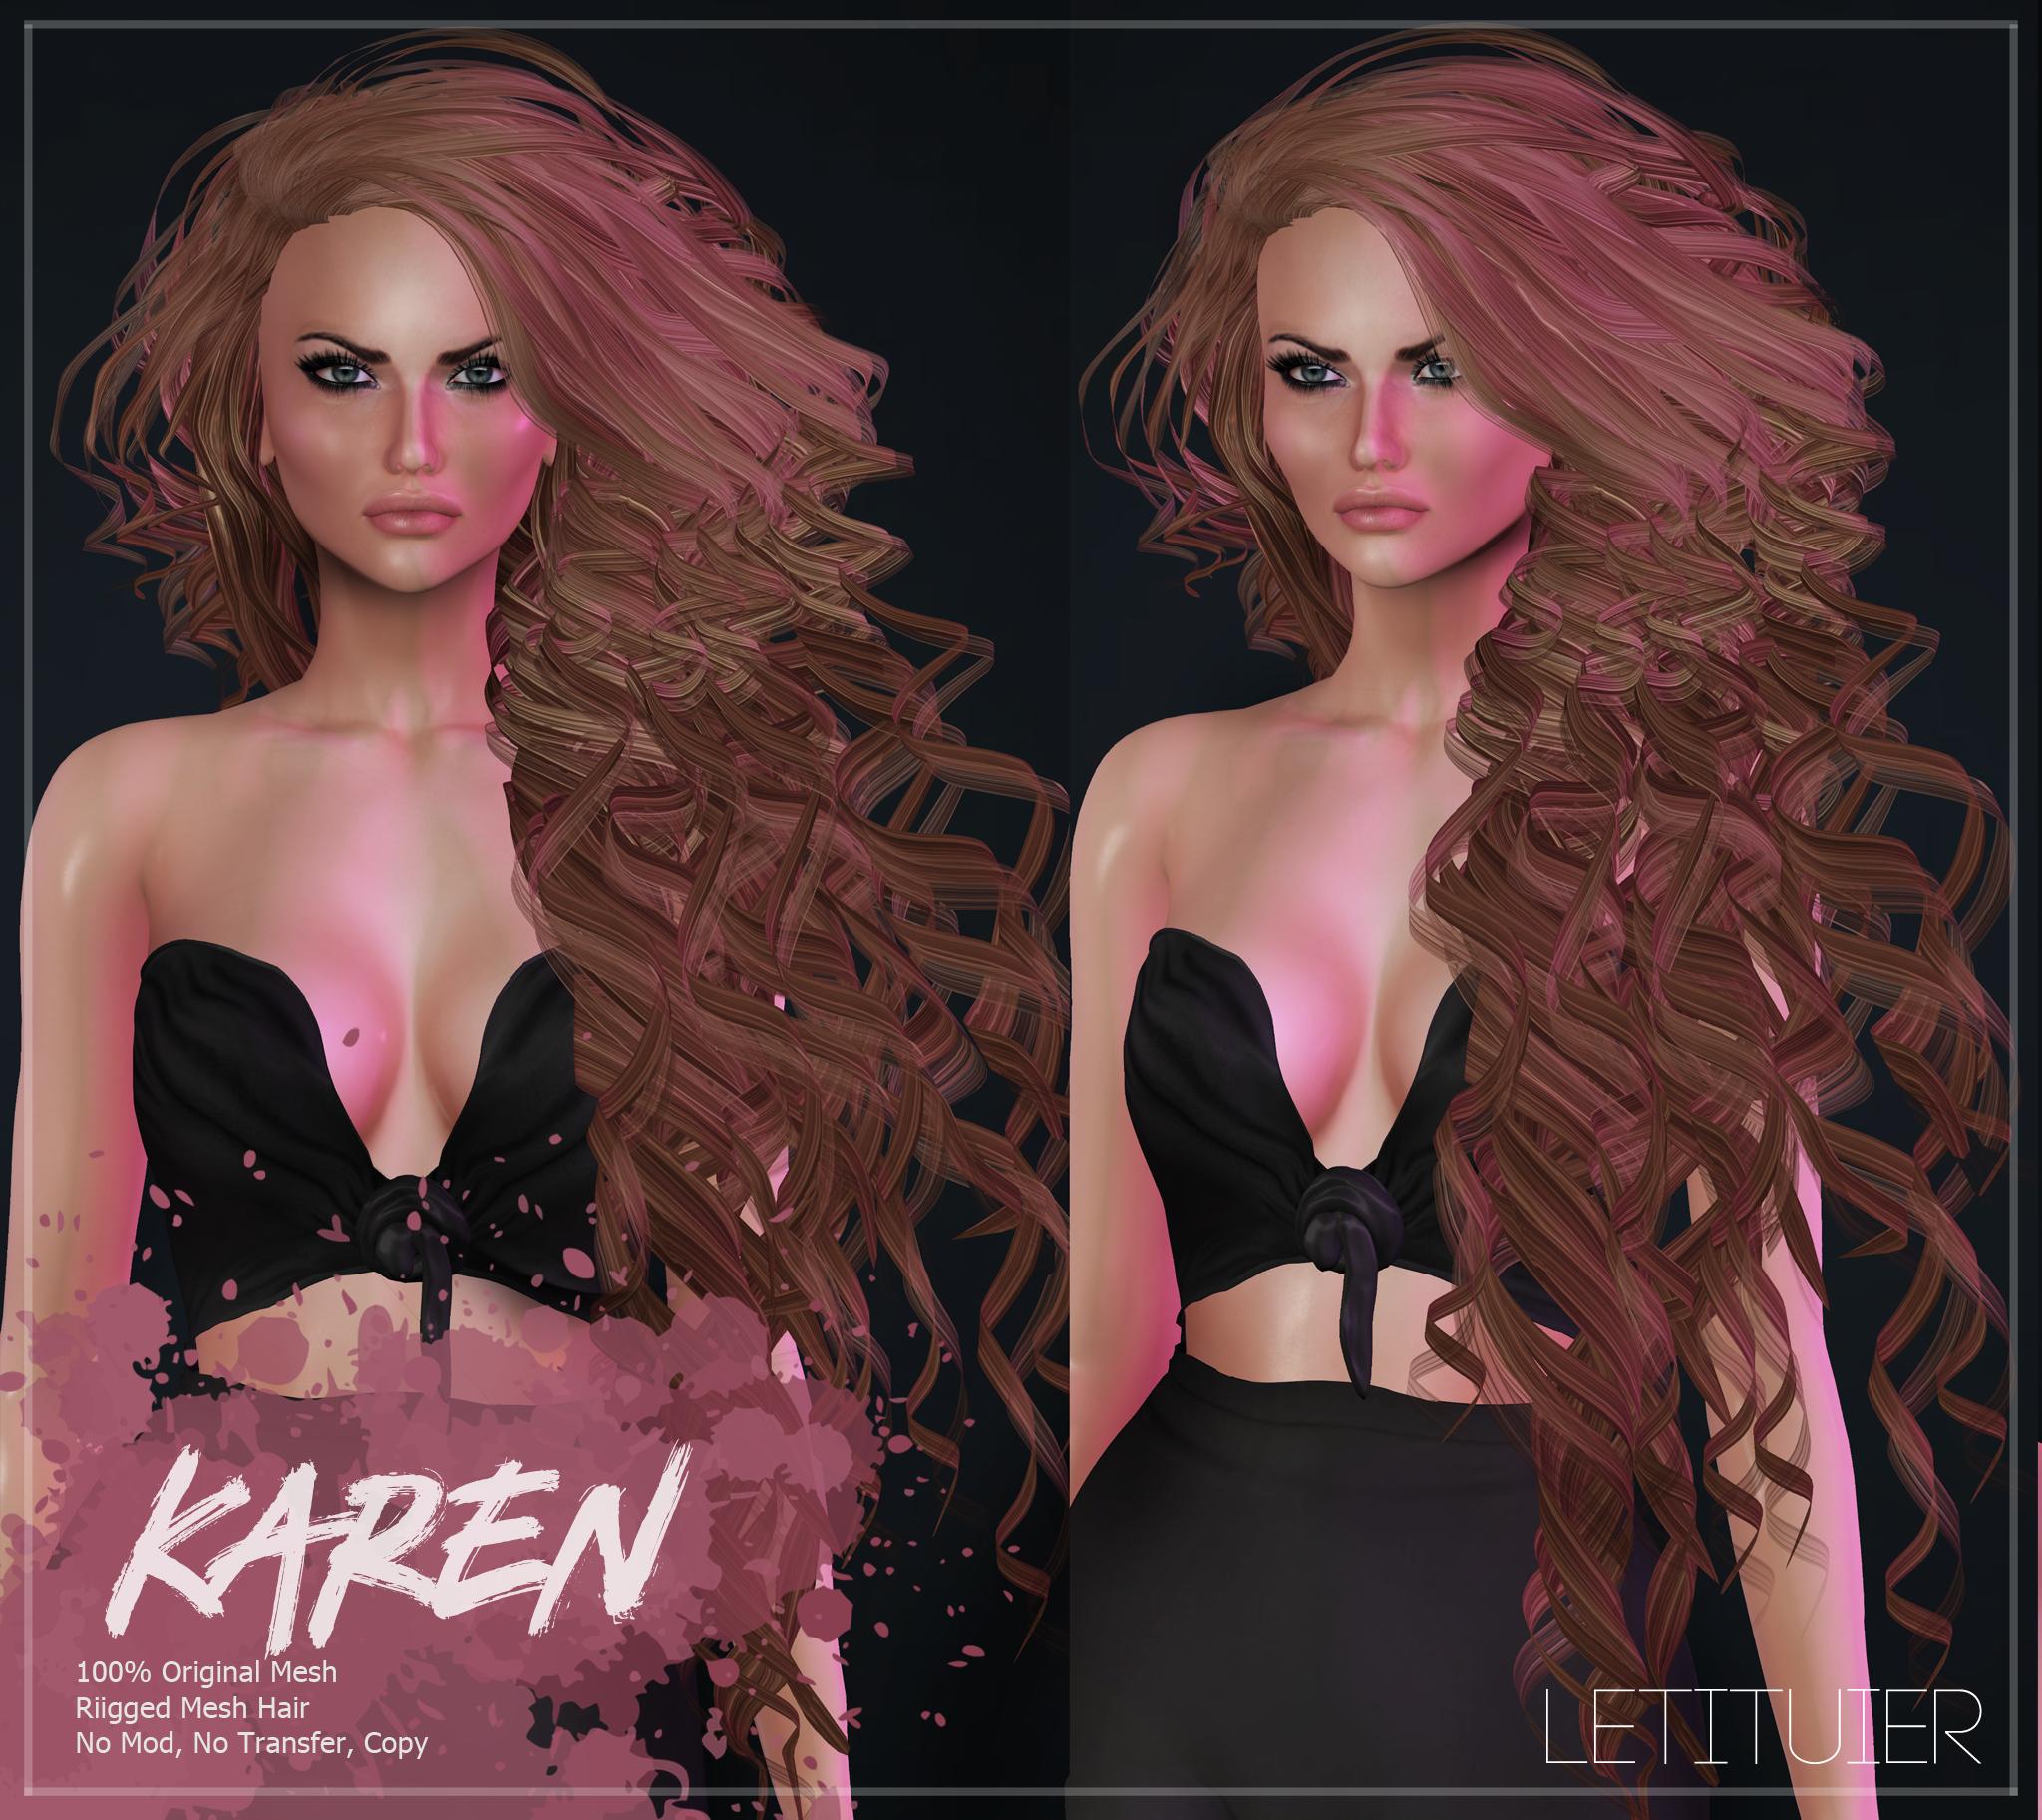 Letituier - Karen Hair.png